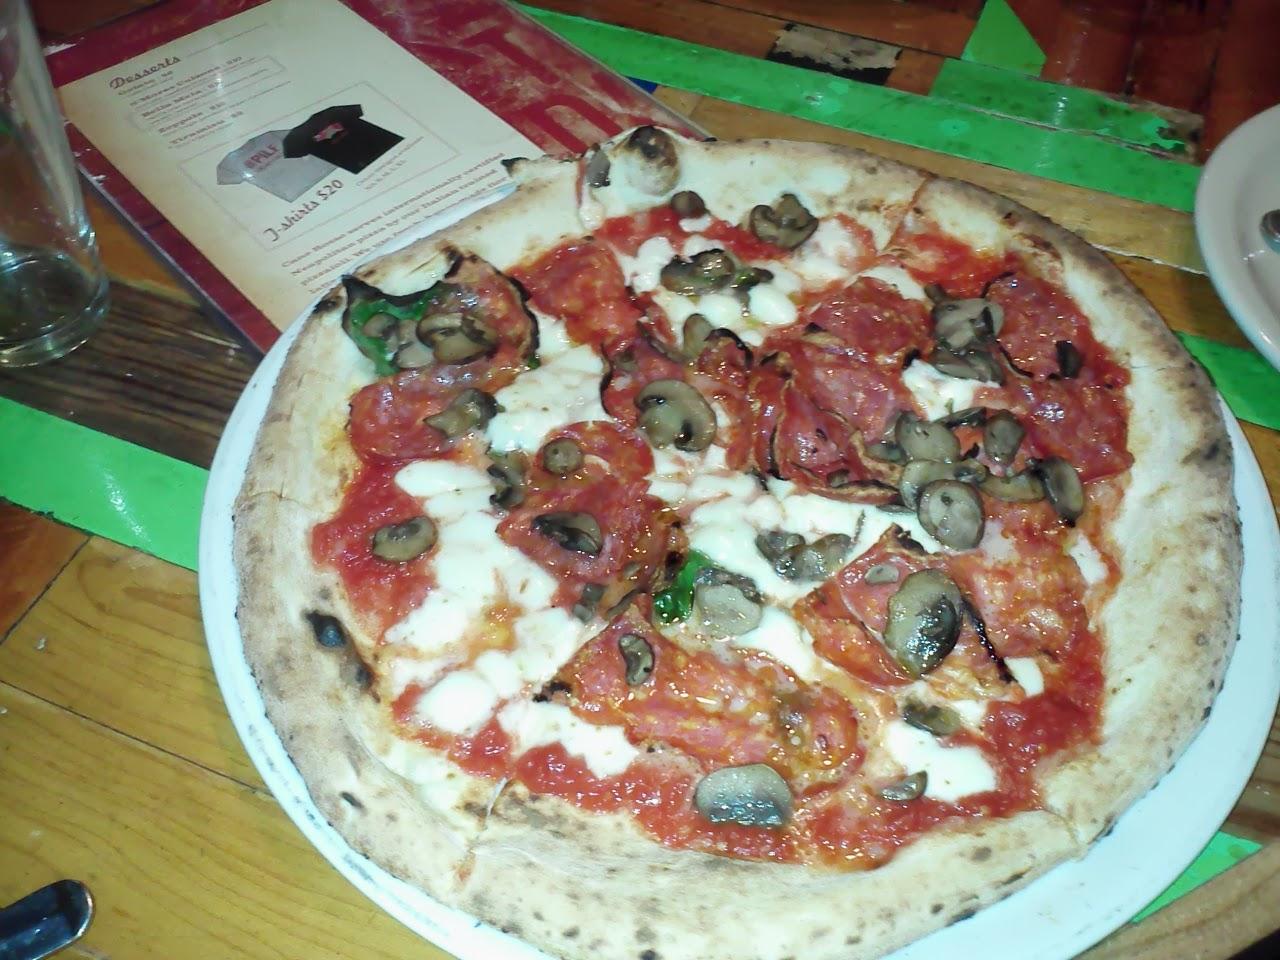 Cane Rosso Cassie Pizza